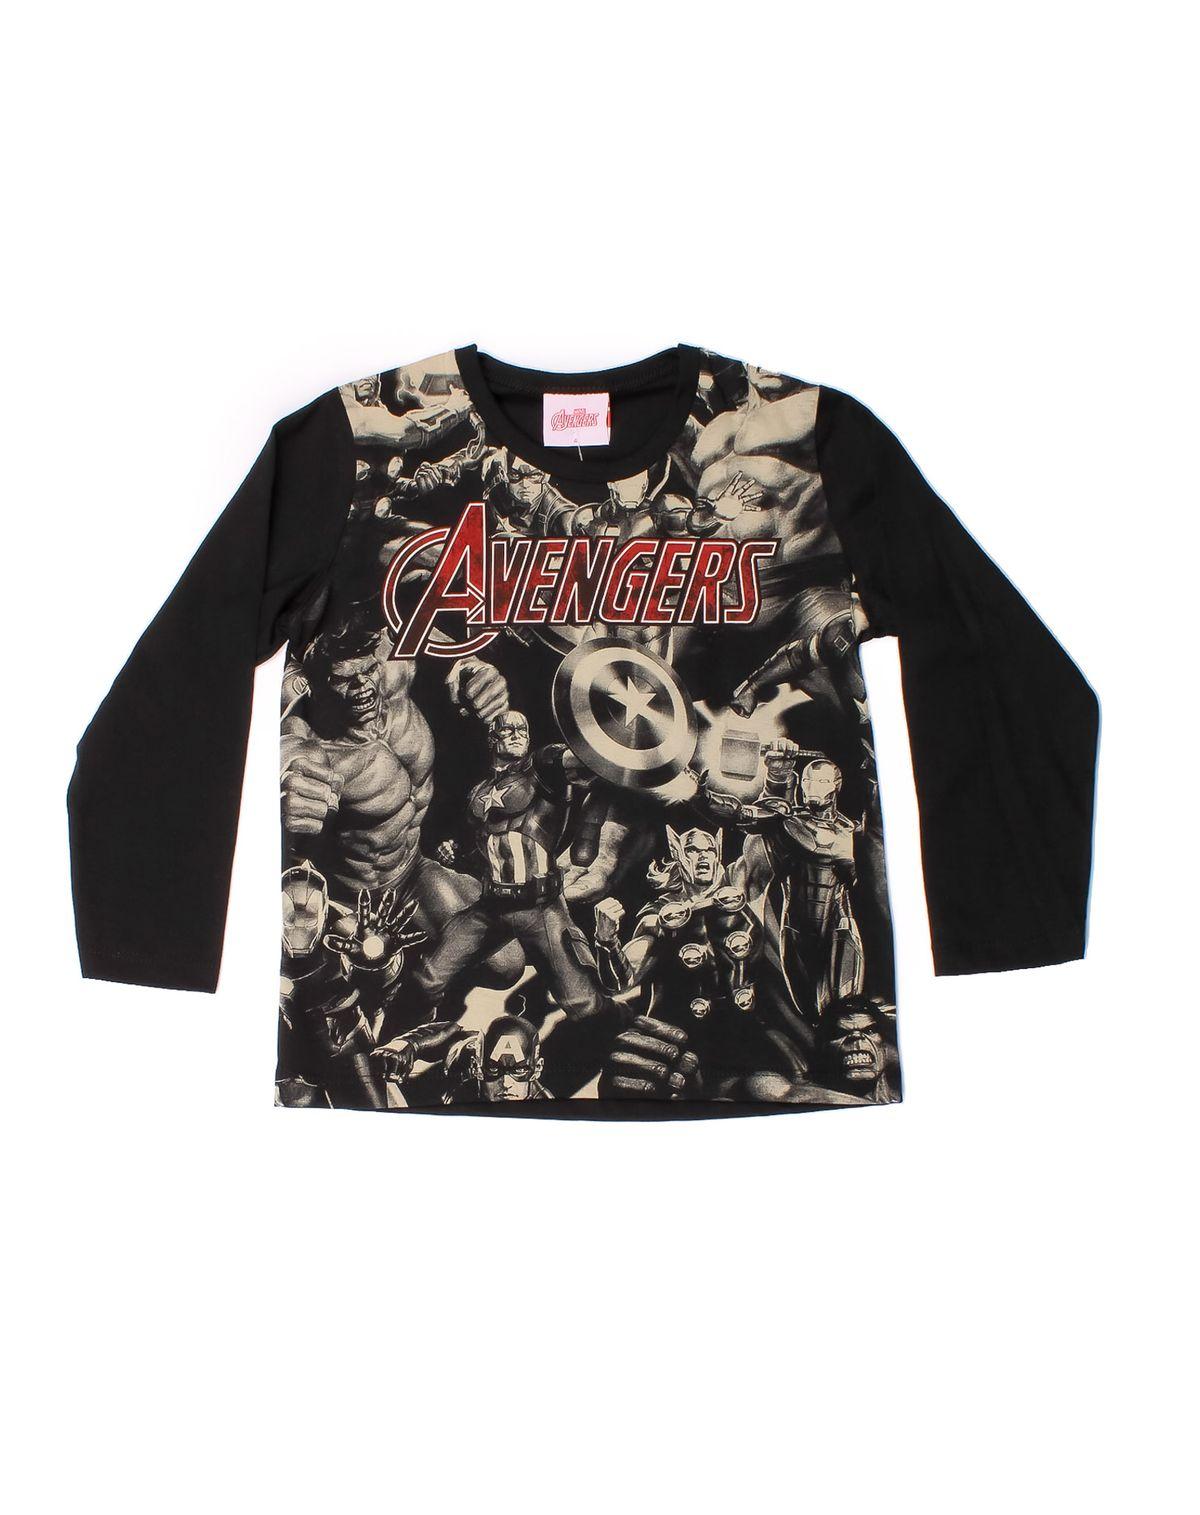 552167001-camiseta-manga-longa-infantil-menino-marvel-avengers-preto-4-1d0